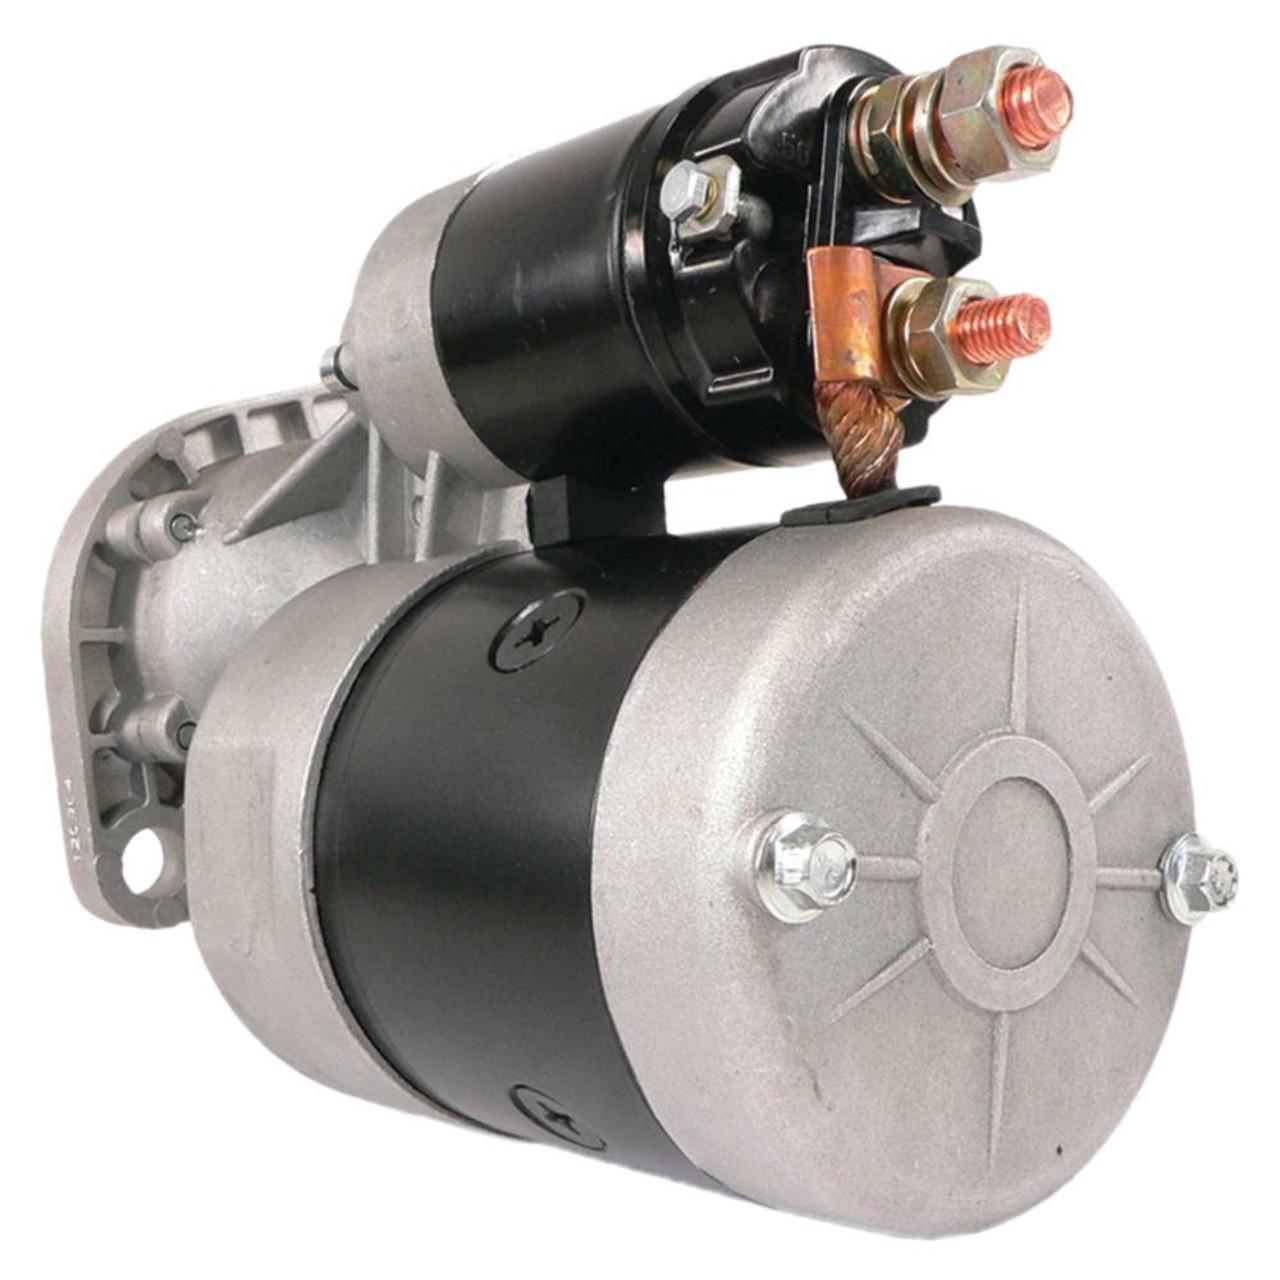 hight resolution of  new starter for john deere tractor ty6720 complete tractor on john deere 6420 wiring